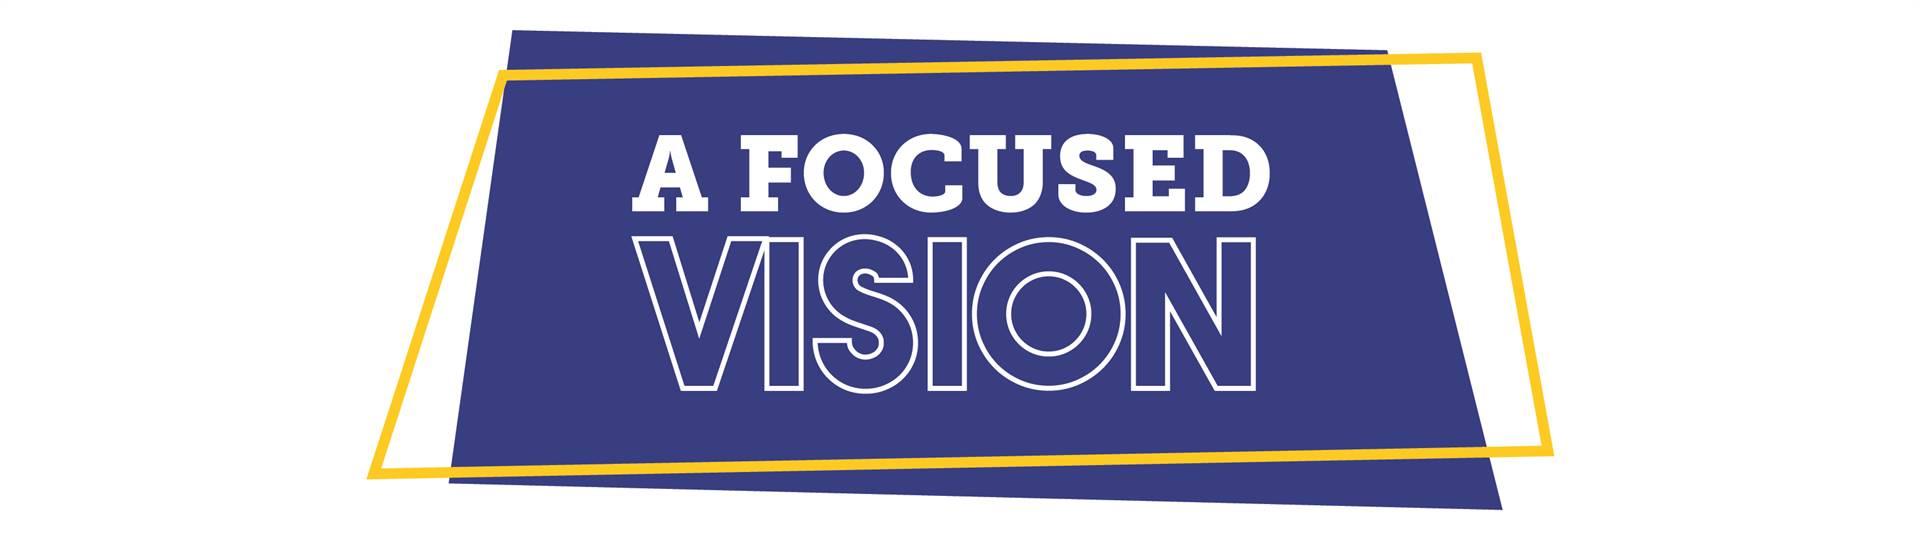 A Focused Vision